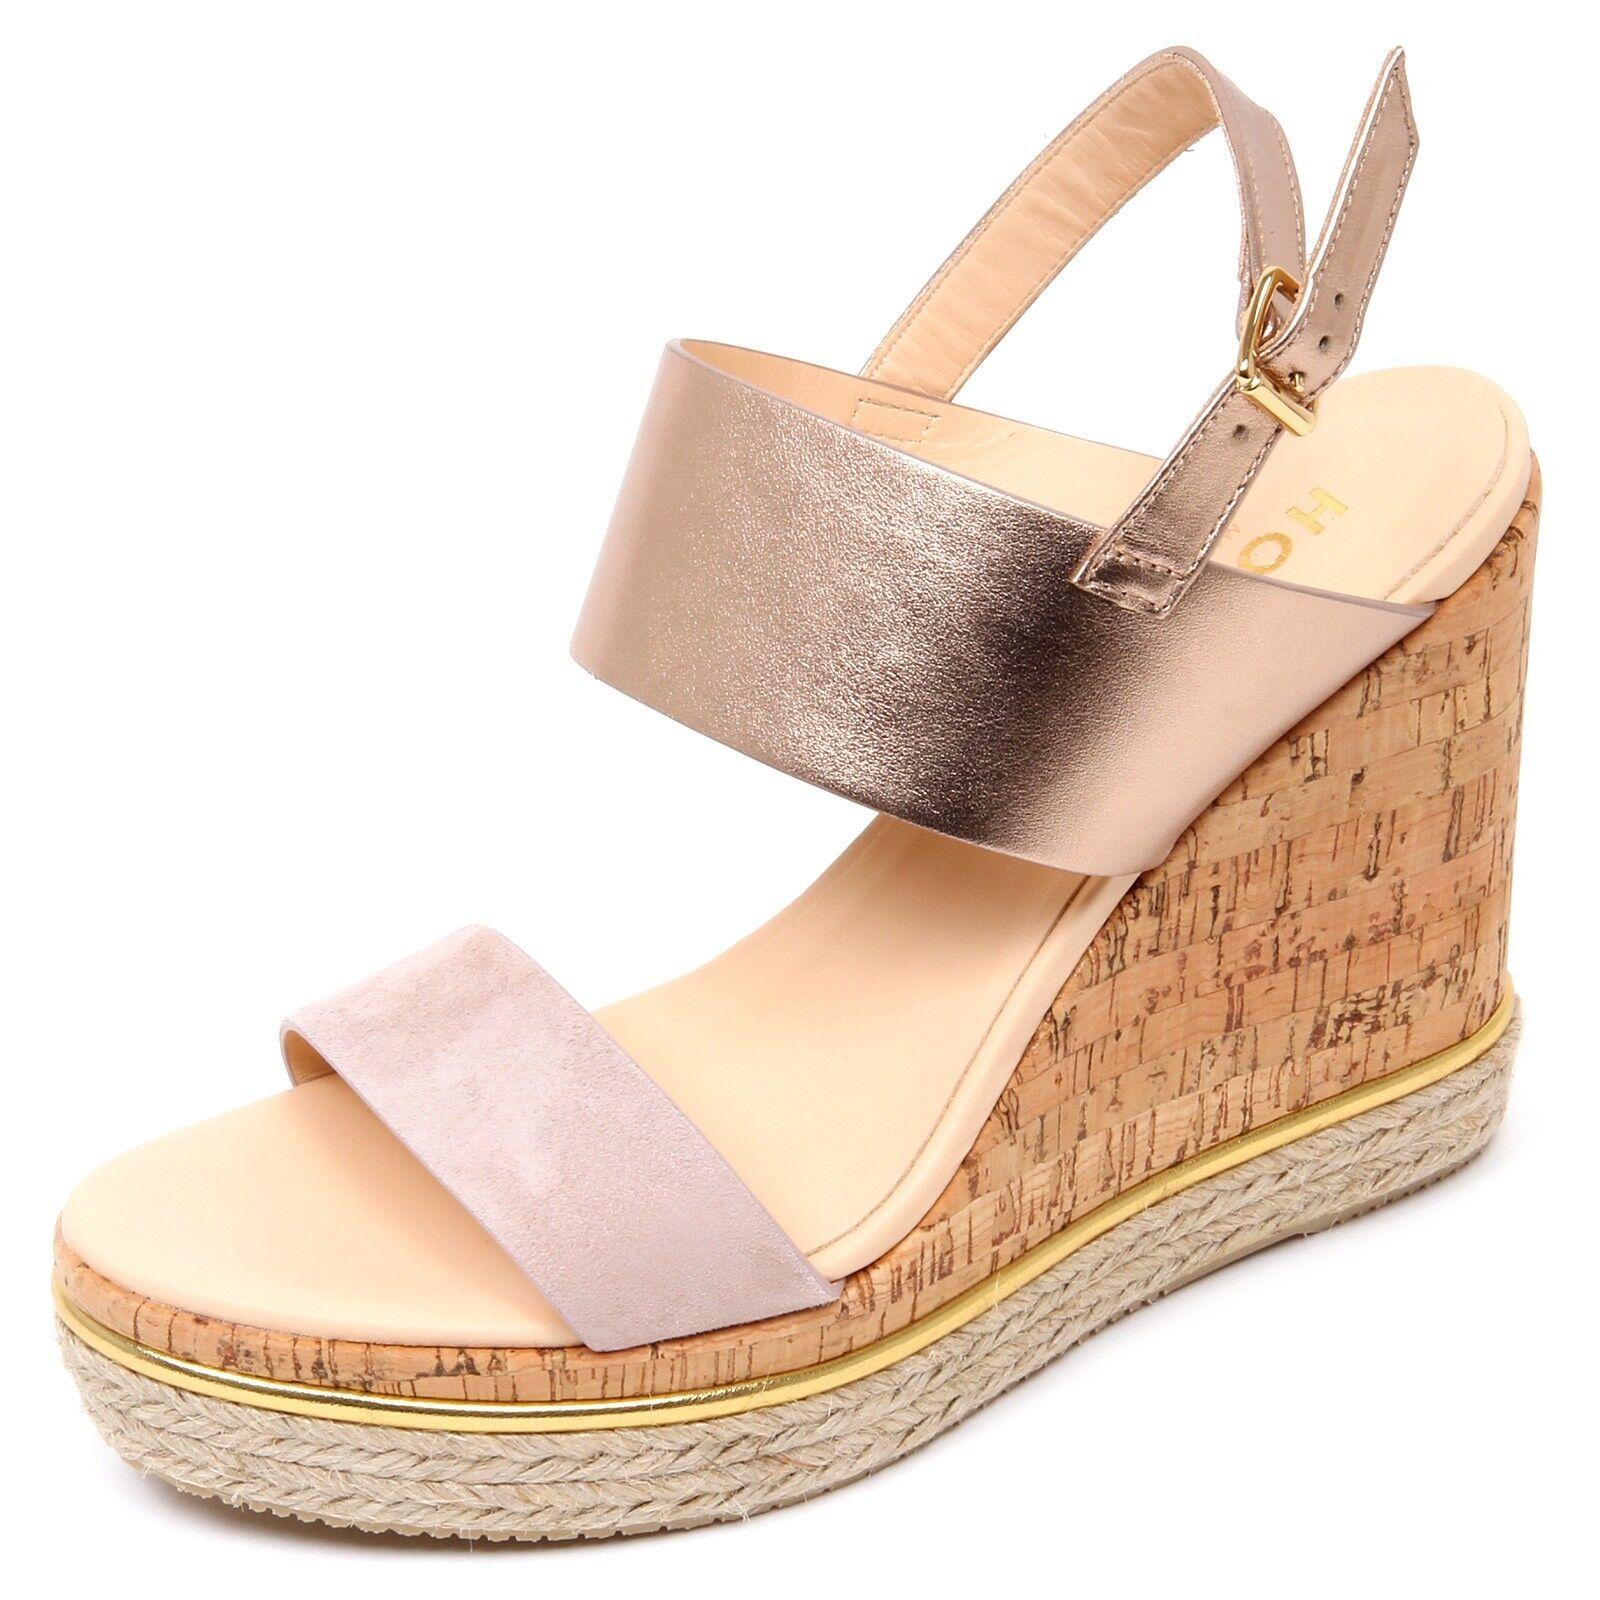 D0336 Sandal Woman Hogan h324 shoes Wedge Cork Pink Pink Platinum shoe woman